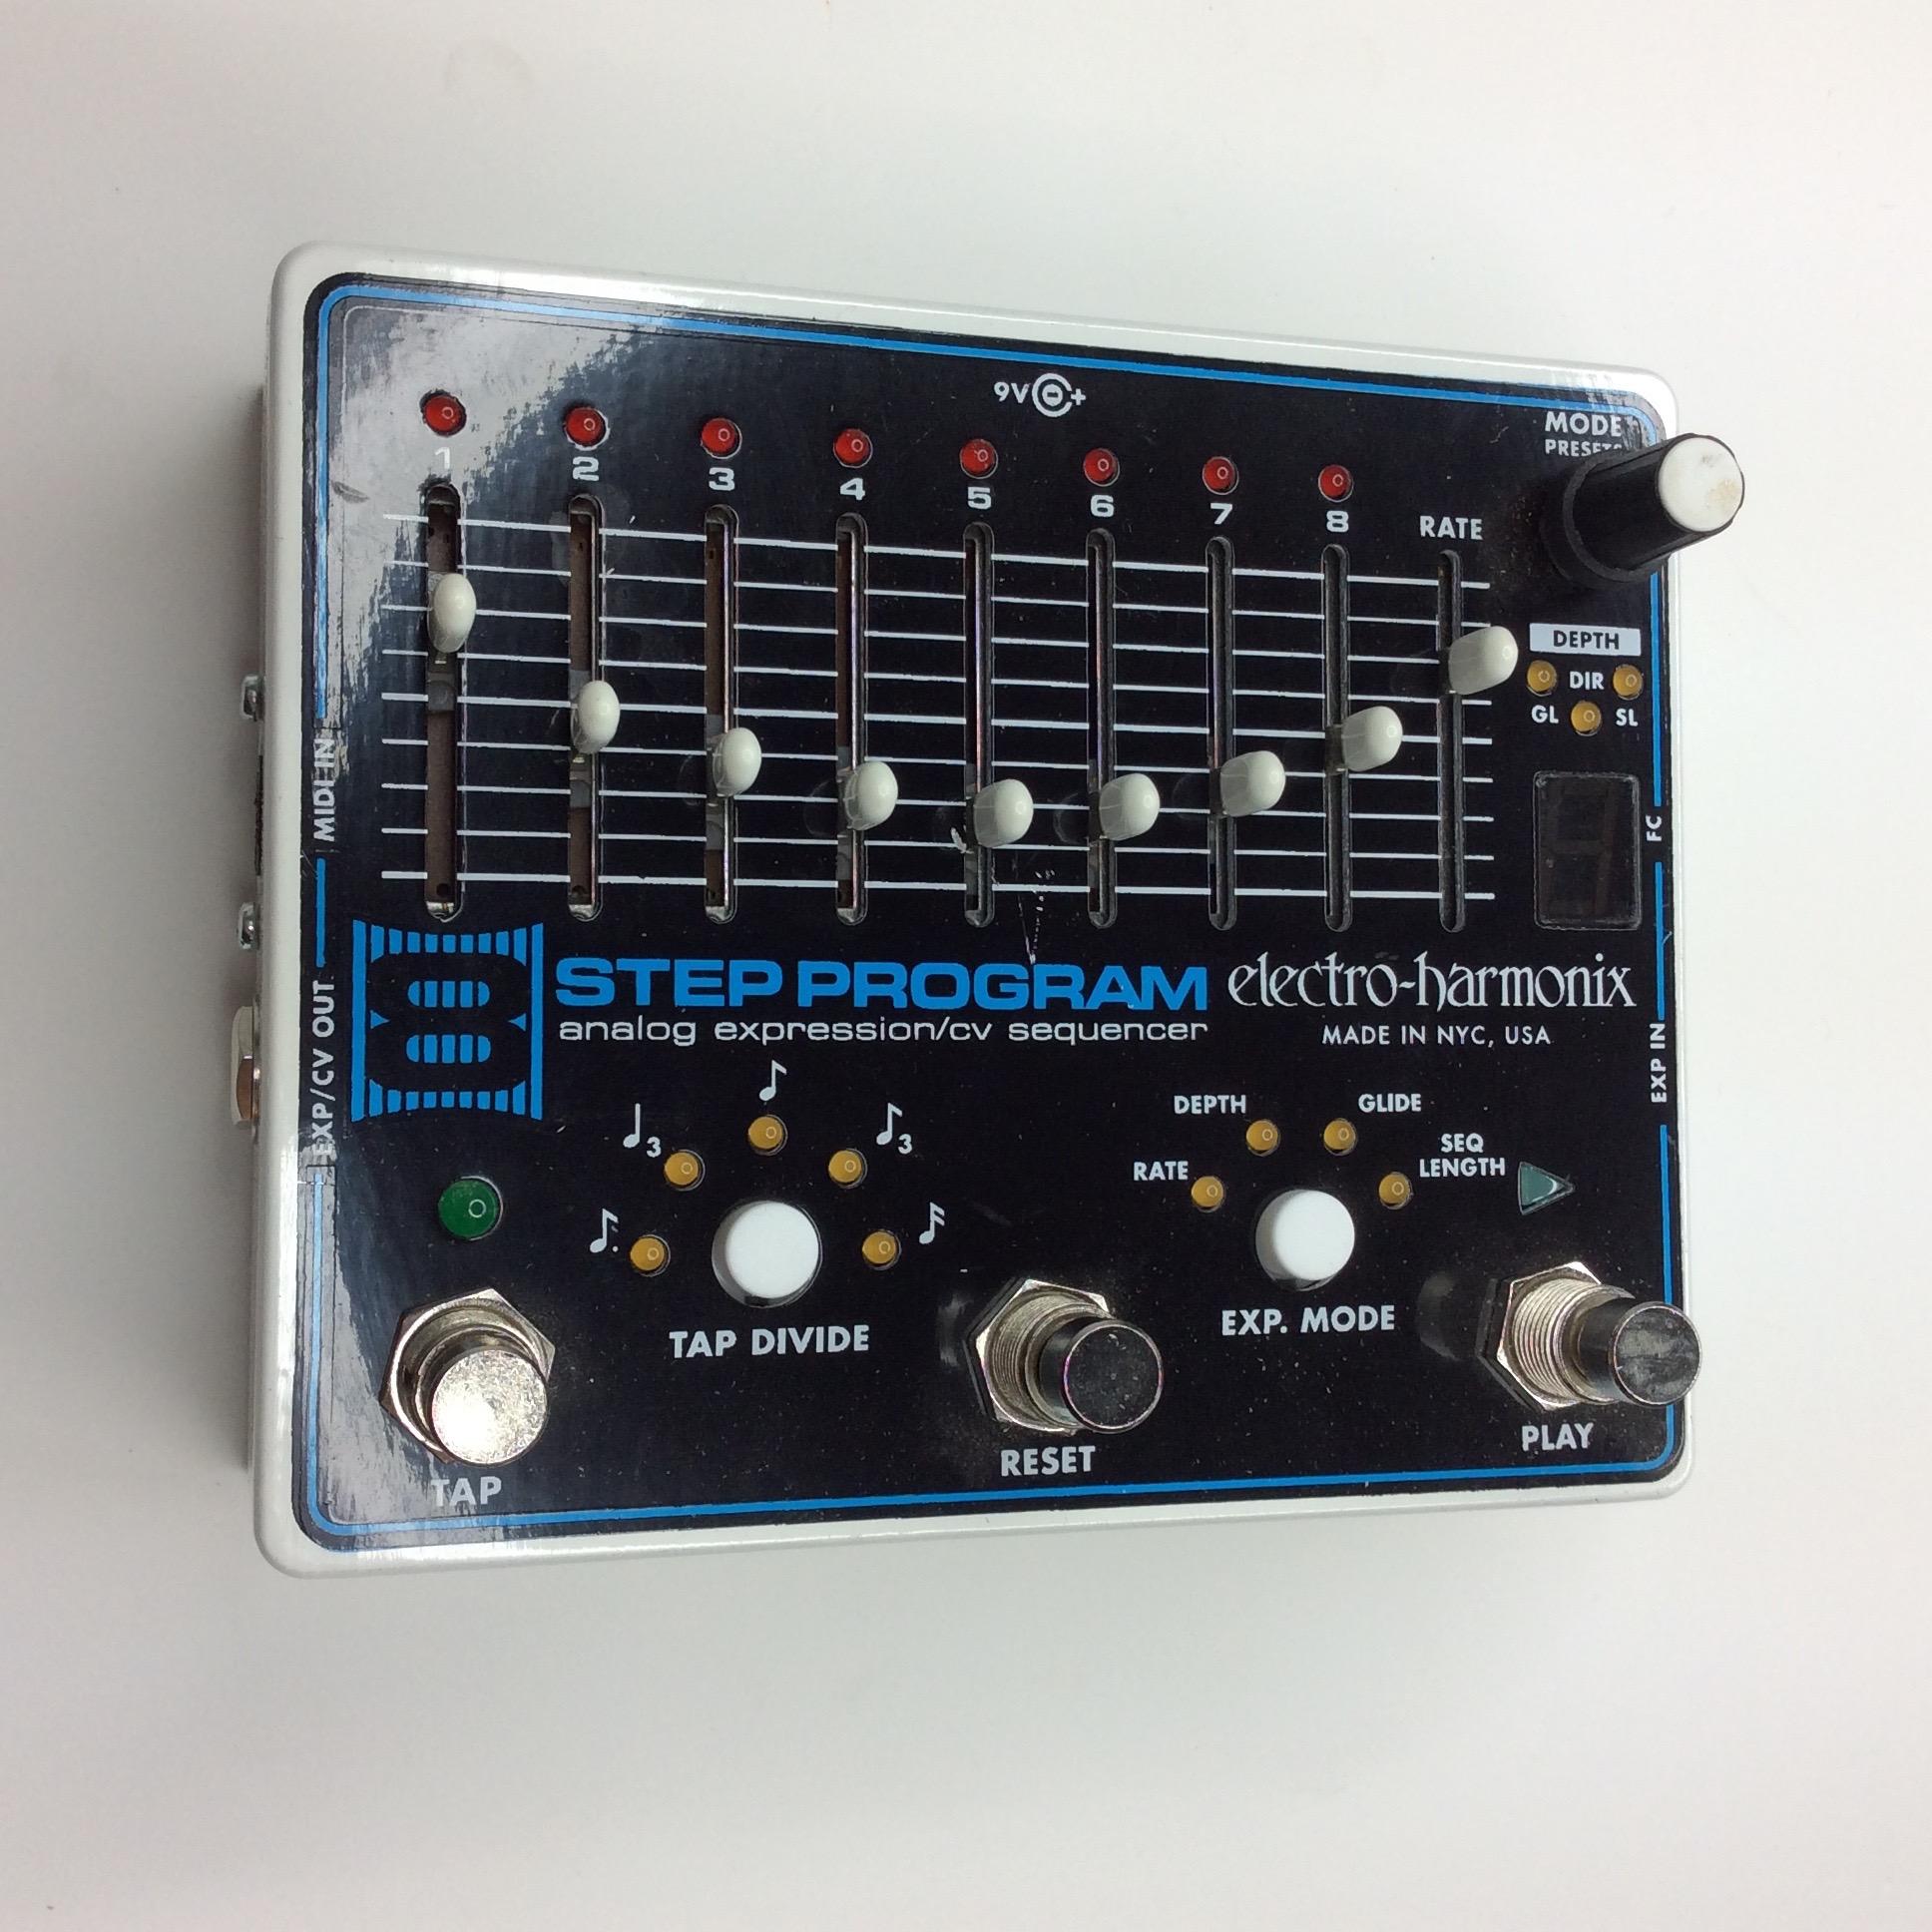 8 Step Program  Make: electro-harmonix